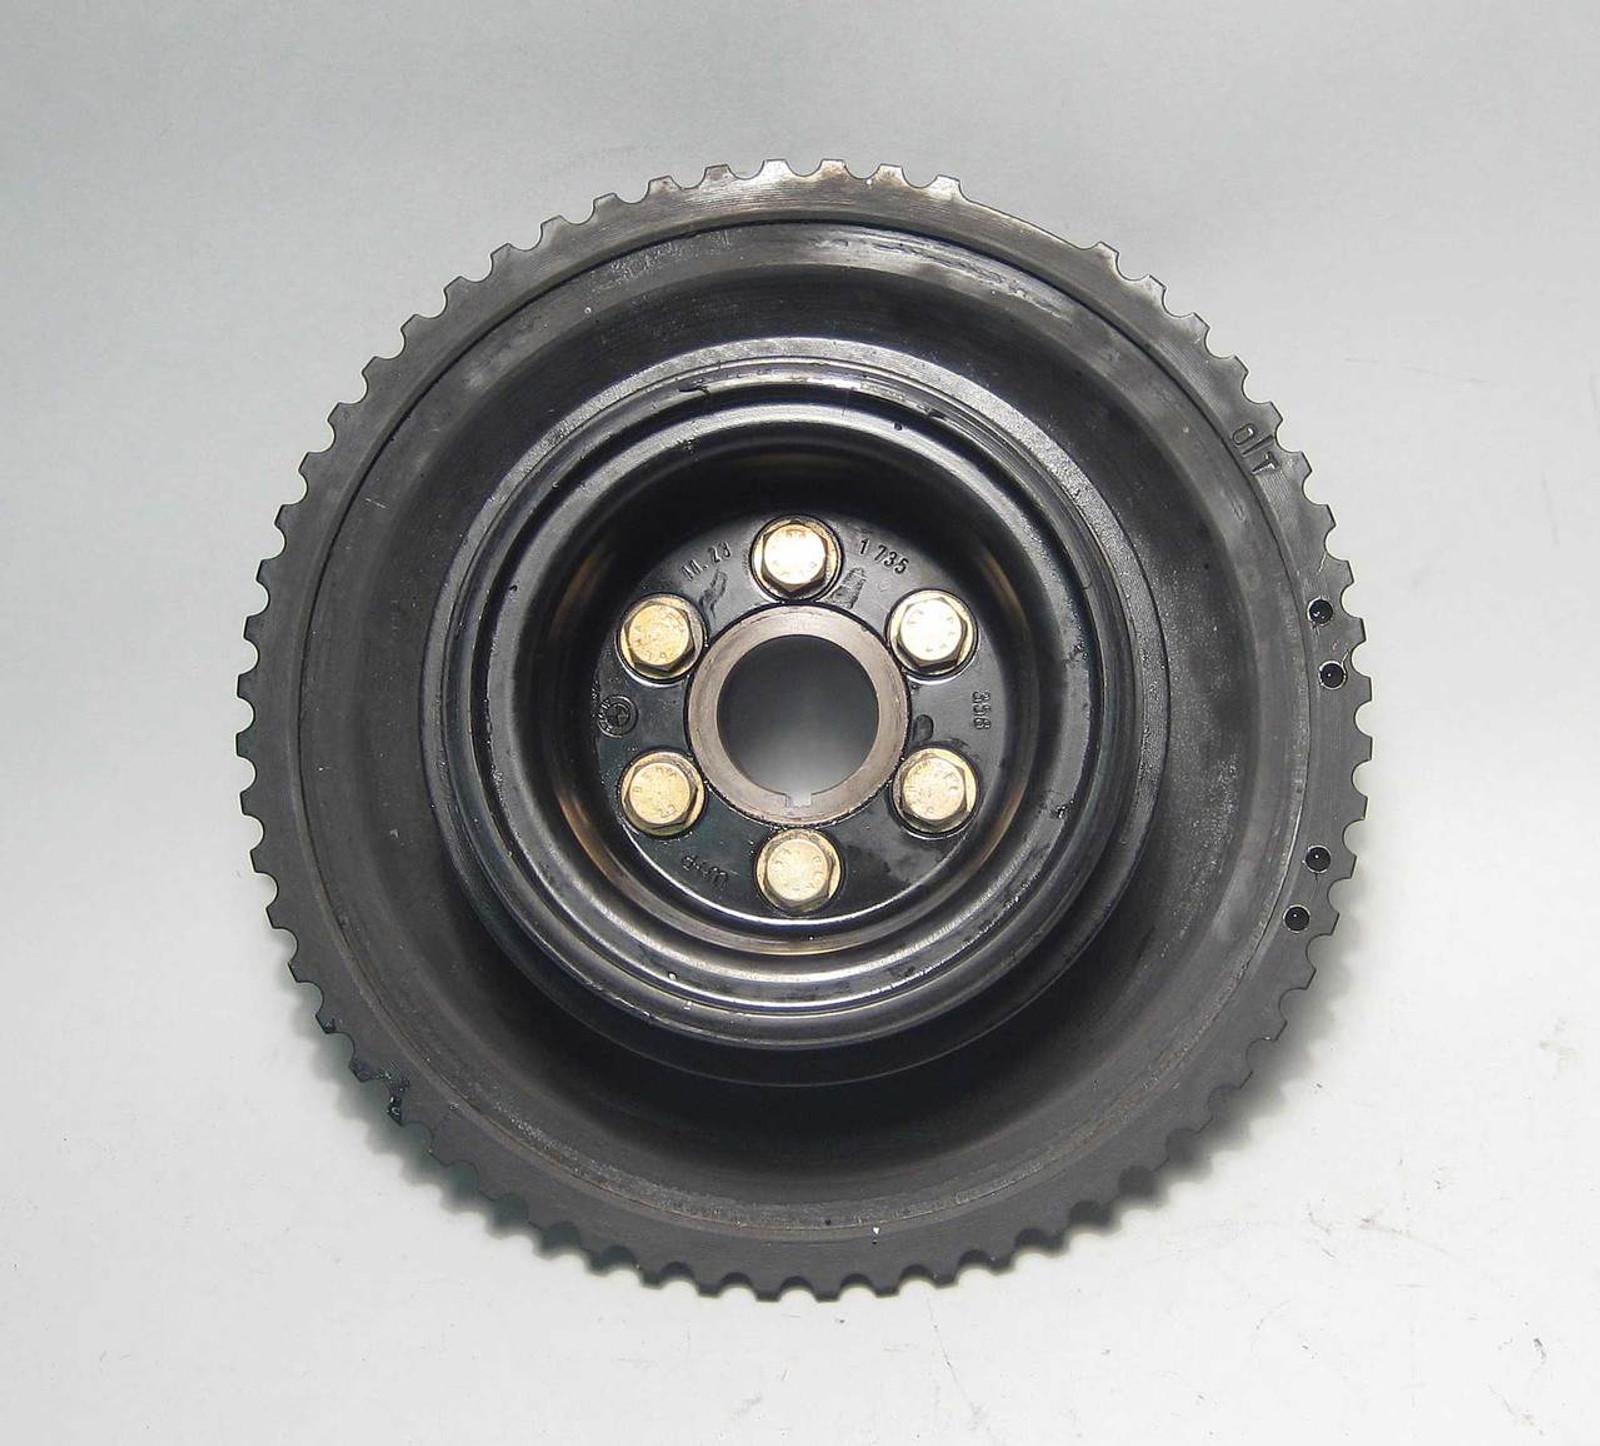 BMW M50 S50 M52 S52 Crank Pulley Vibration Damper Complete 1993-2000 OEM  USED